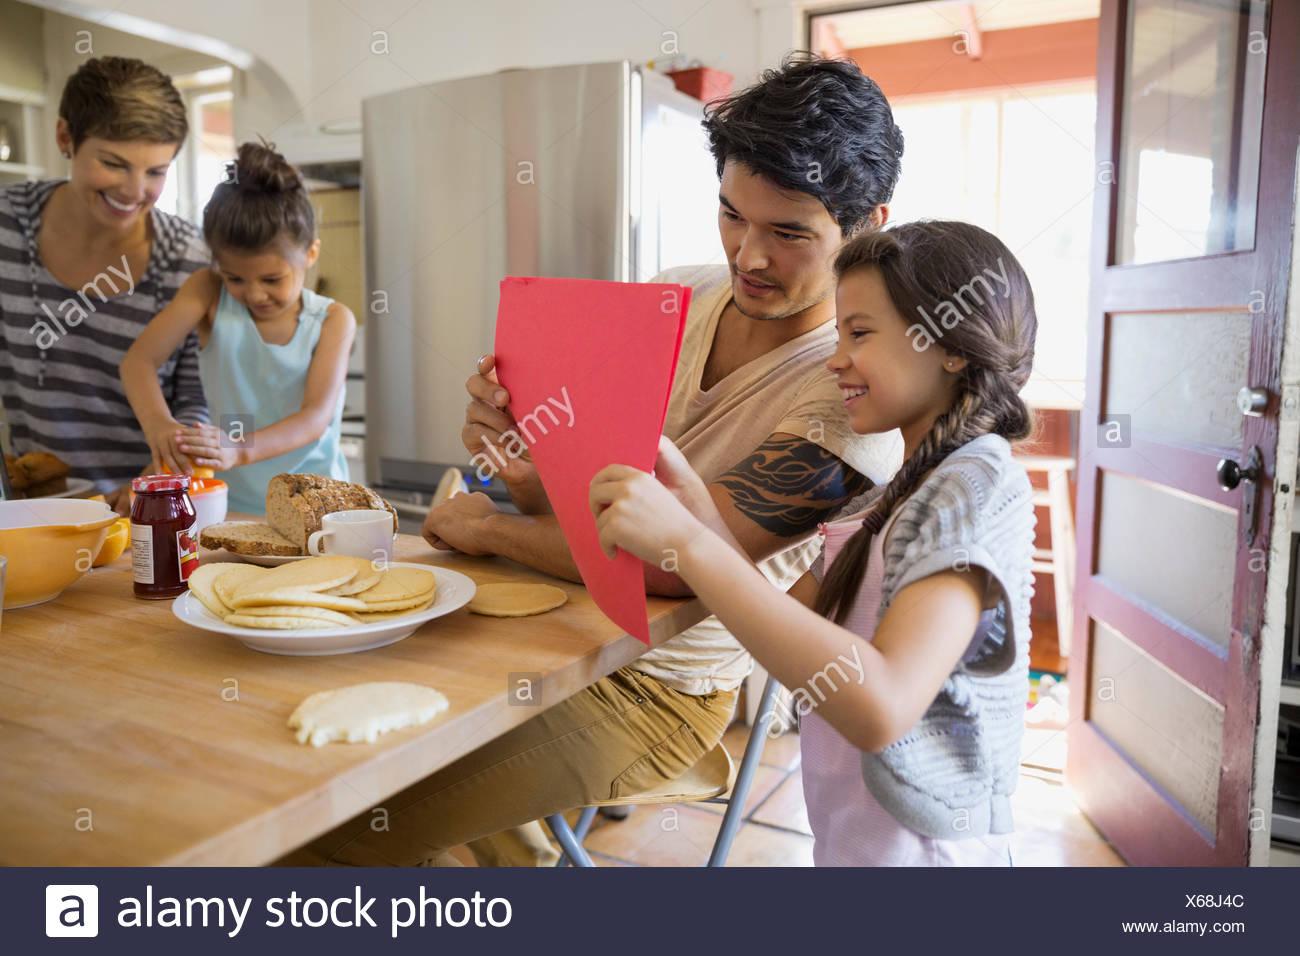 Family enjoying breakfast in kitchen - Stock Image